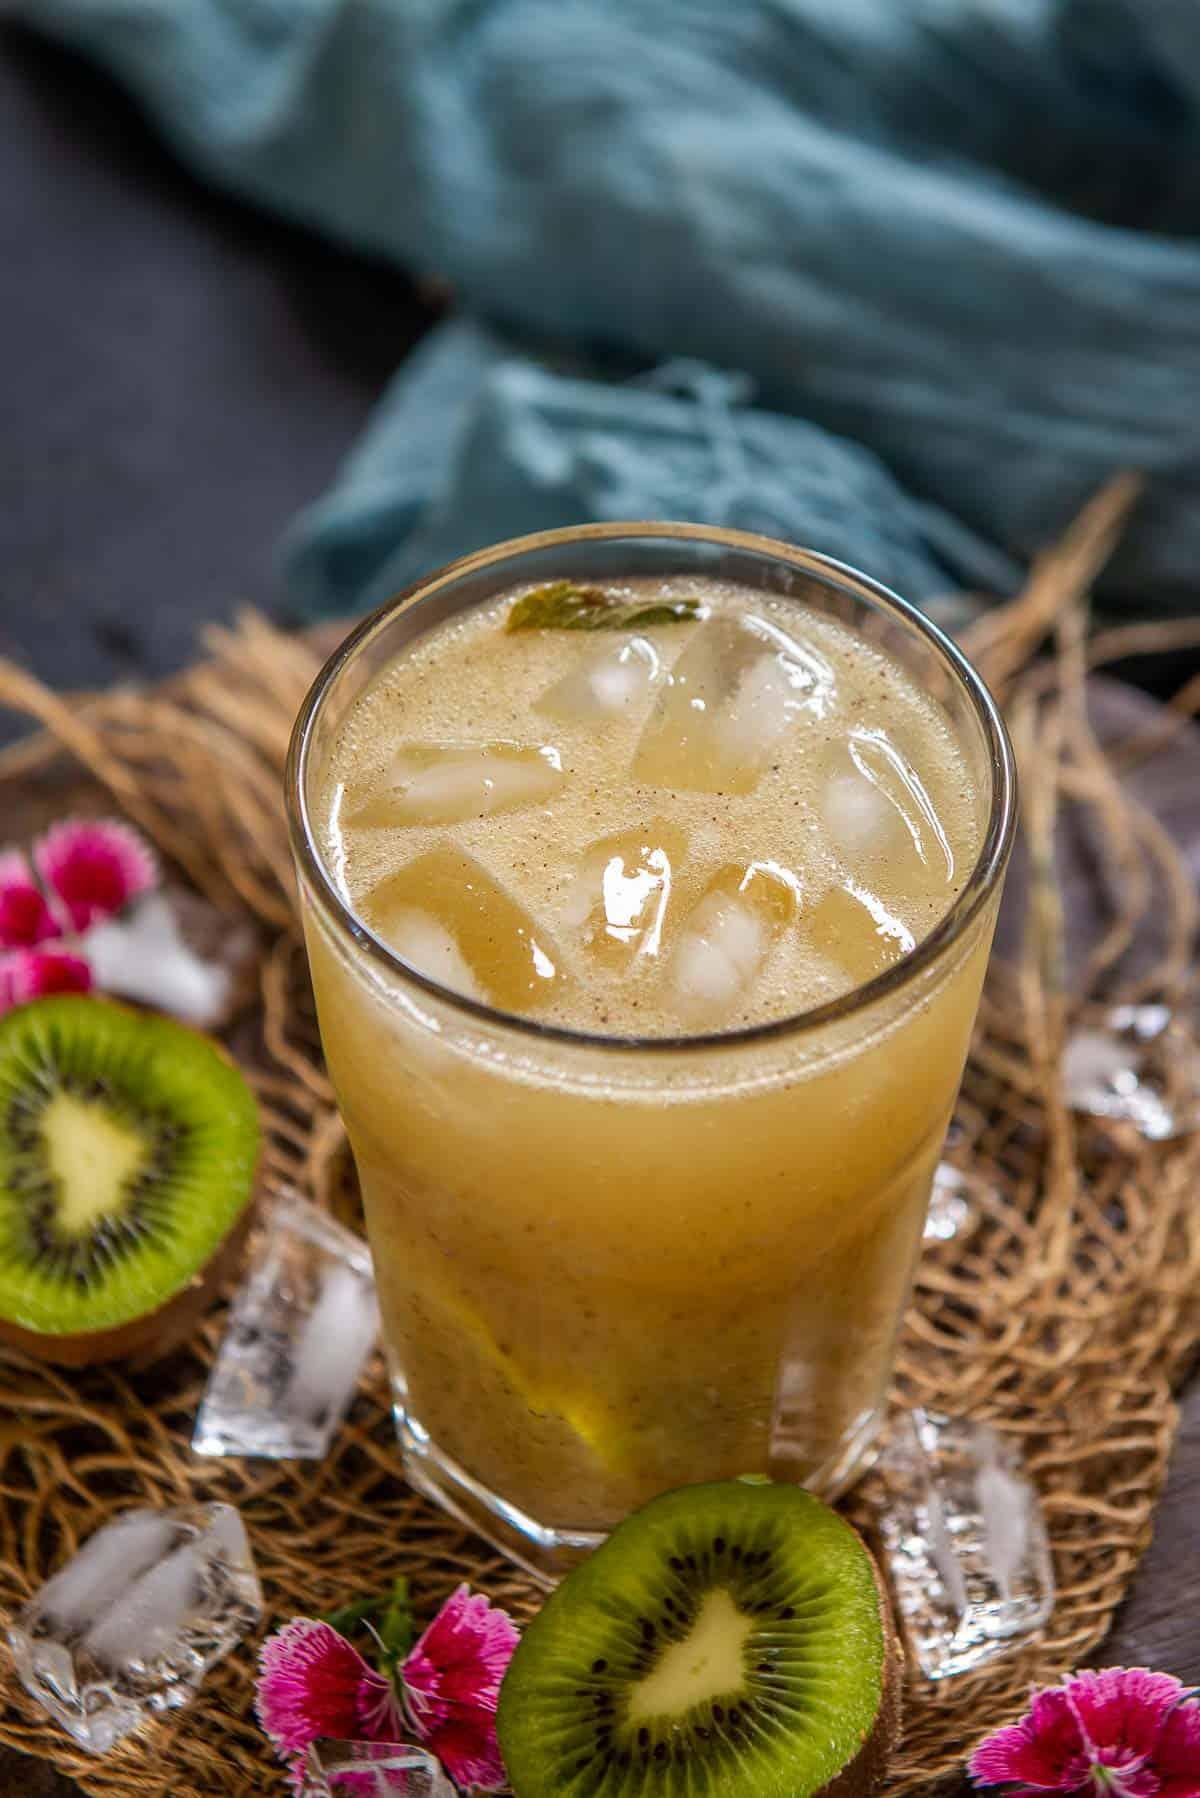 Kiwi soda served in a glass.